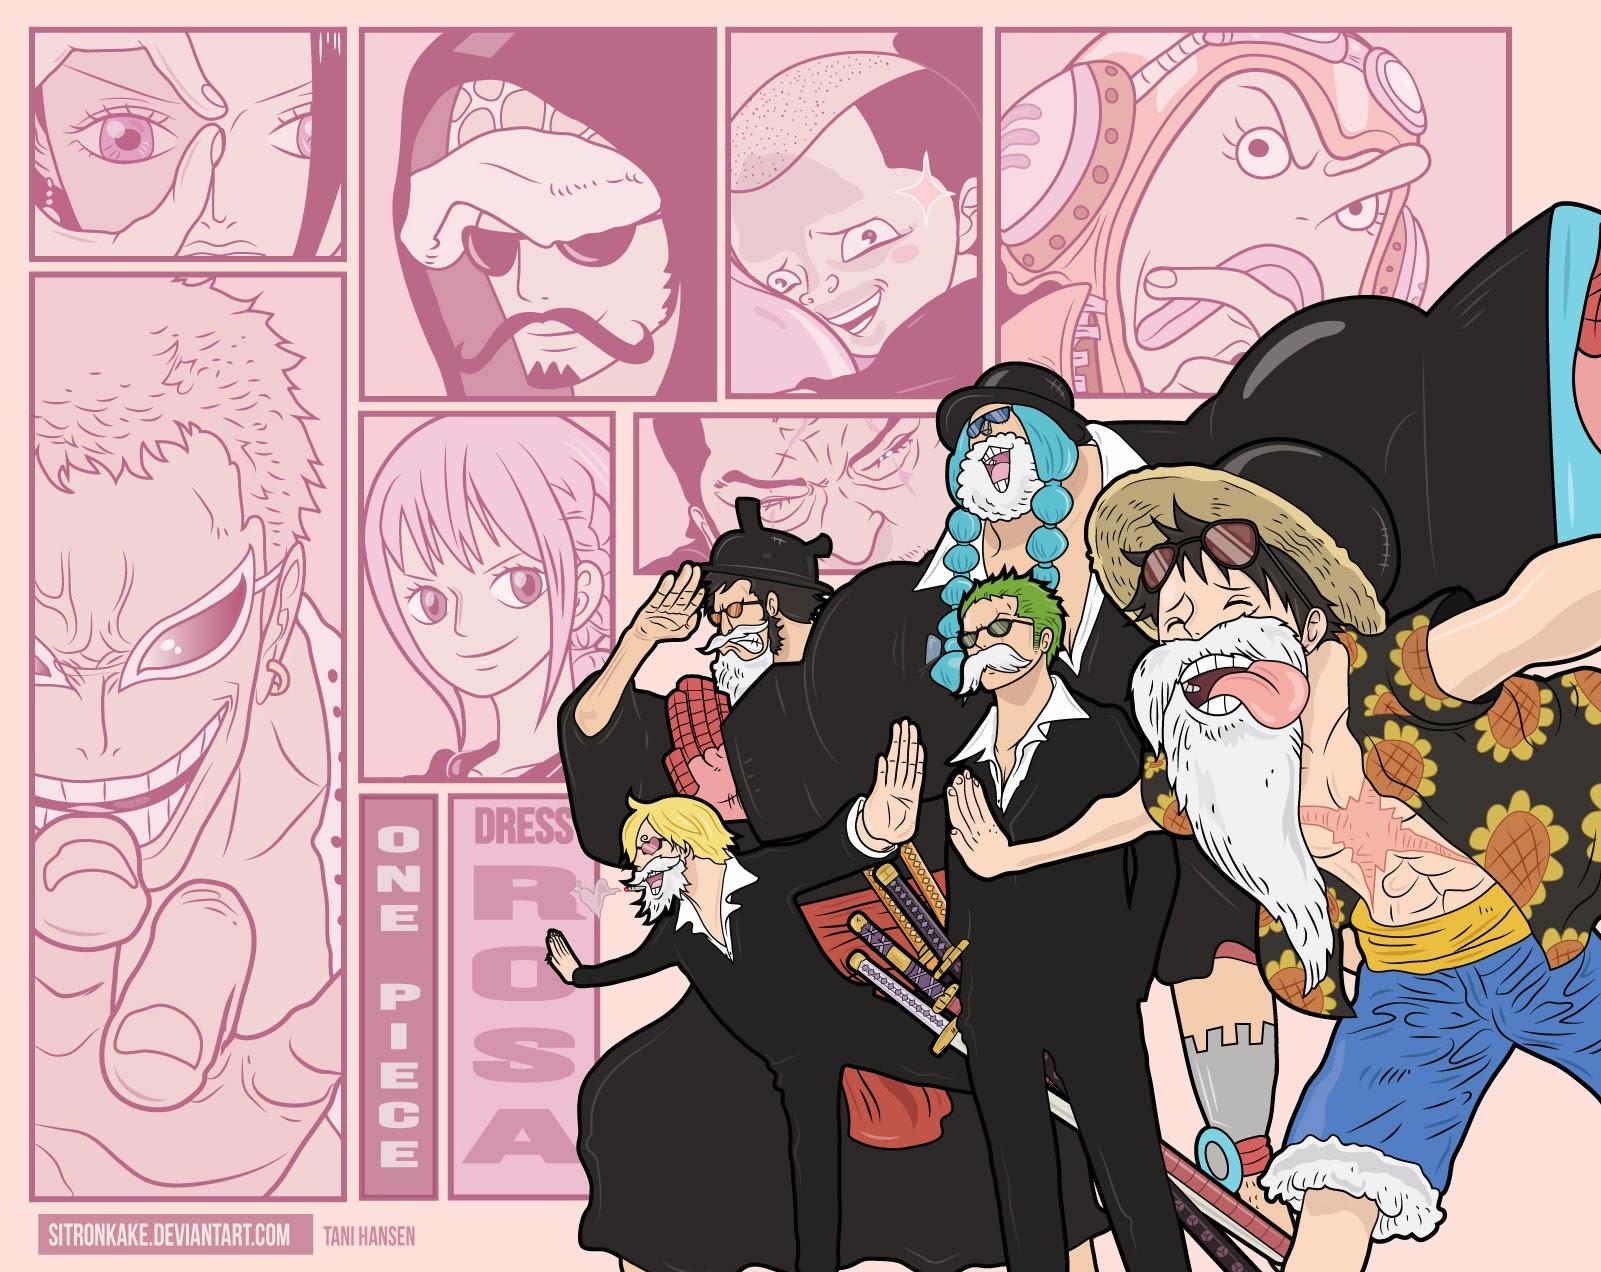 One Piece Chapter 729: Thất Vũ Hải Doflamingo vs. Thất Vũ Hải Law 017